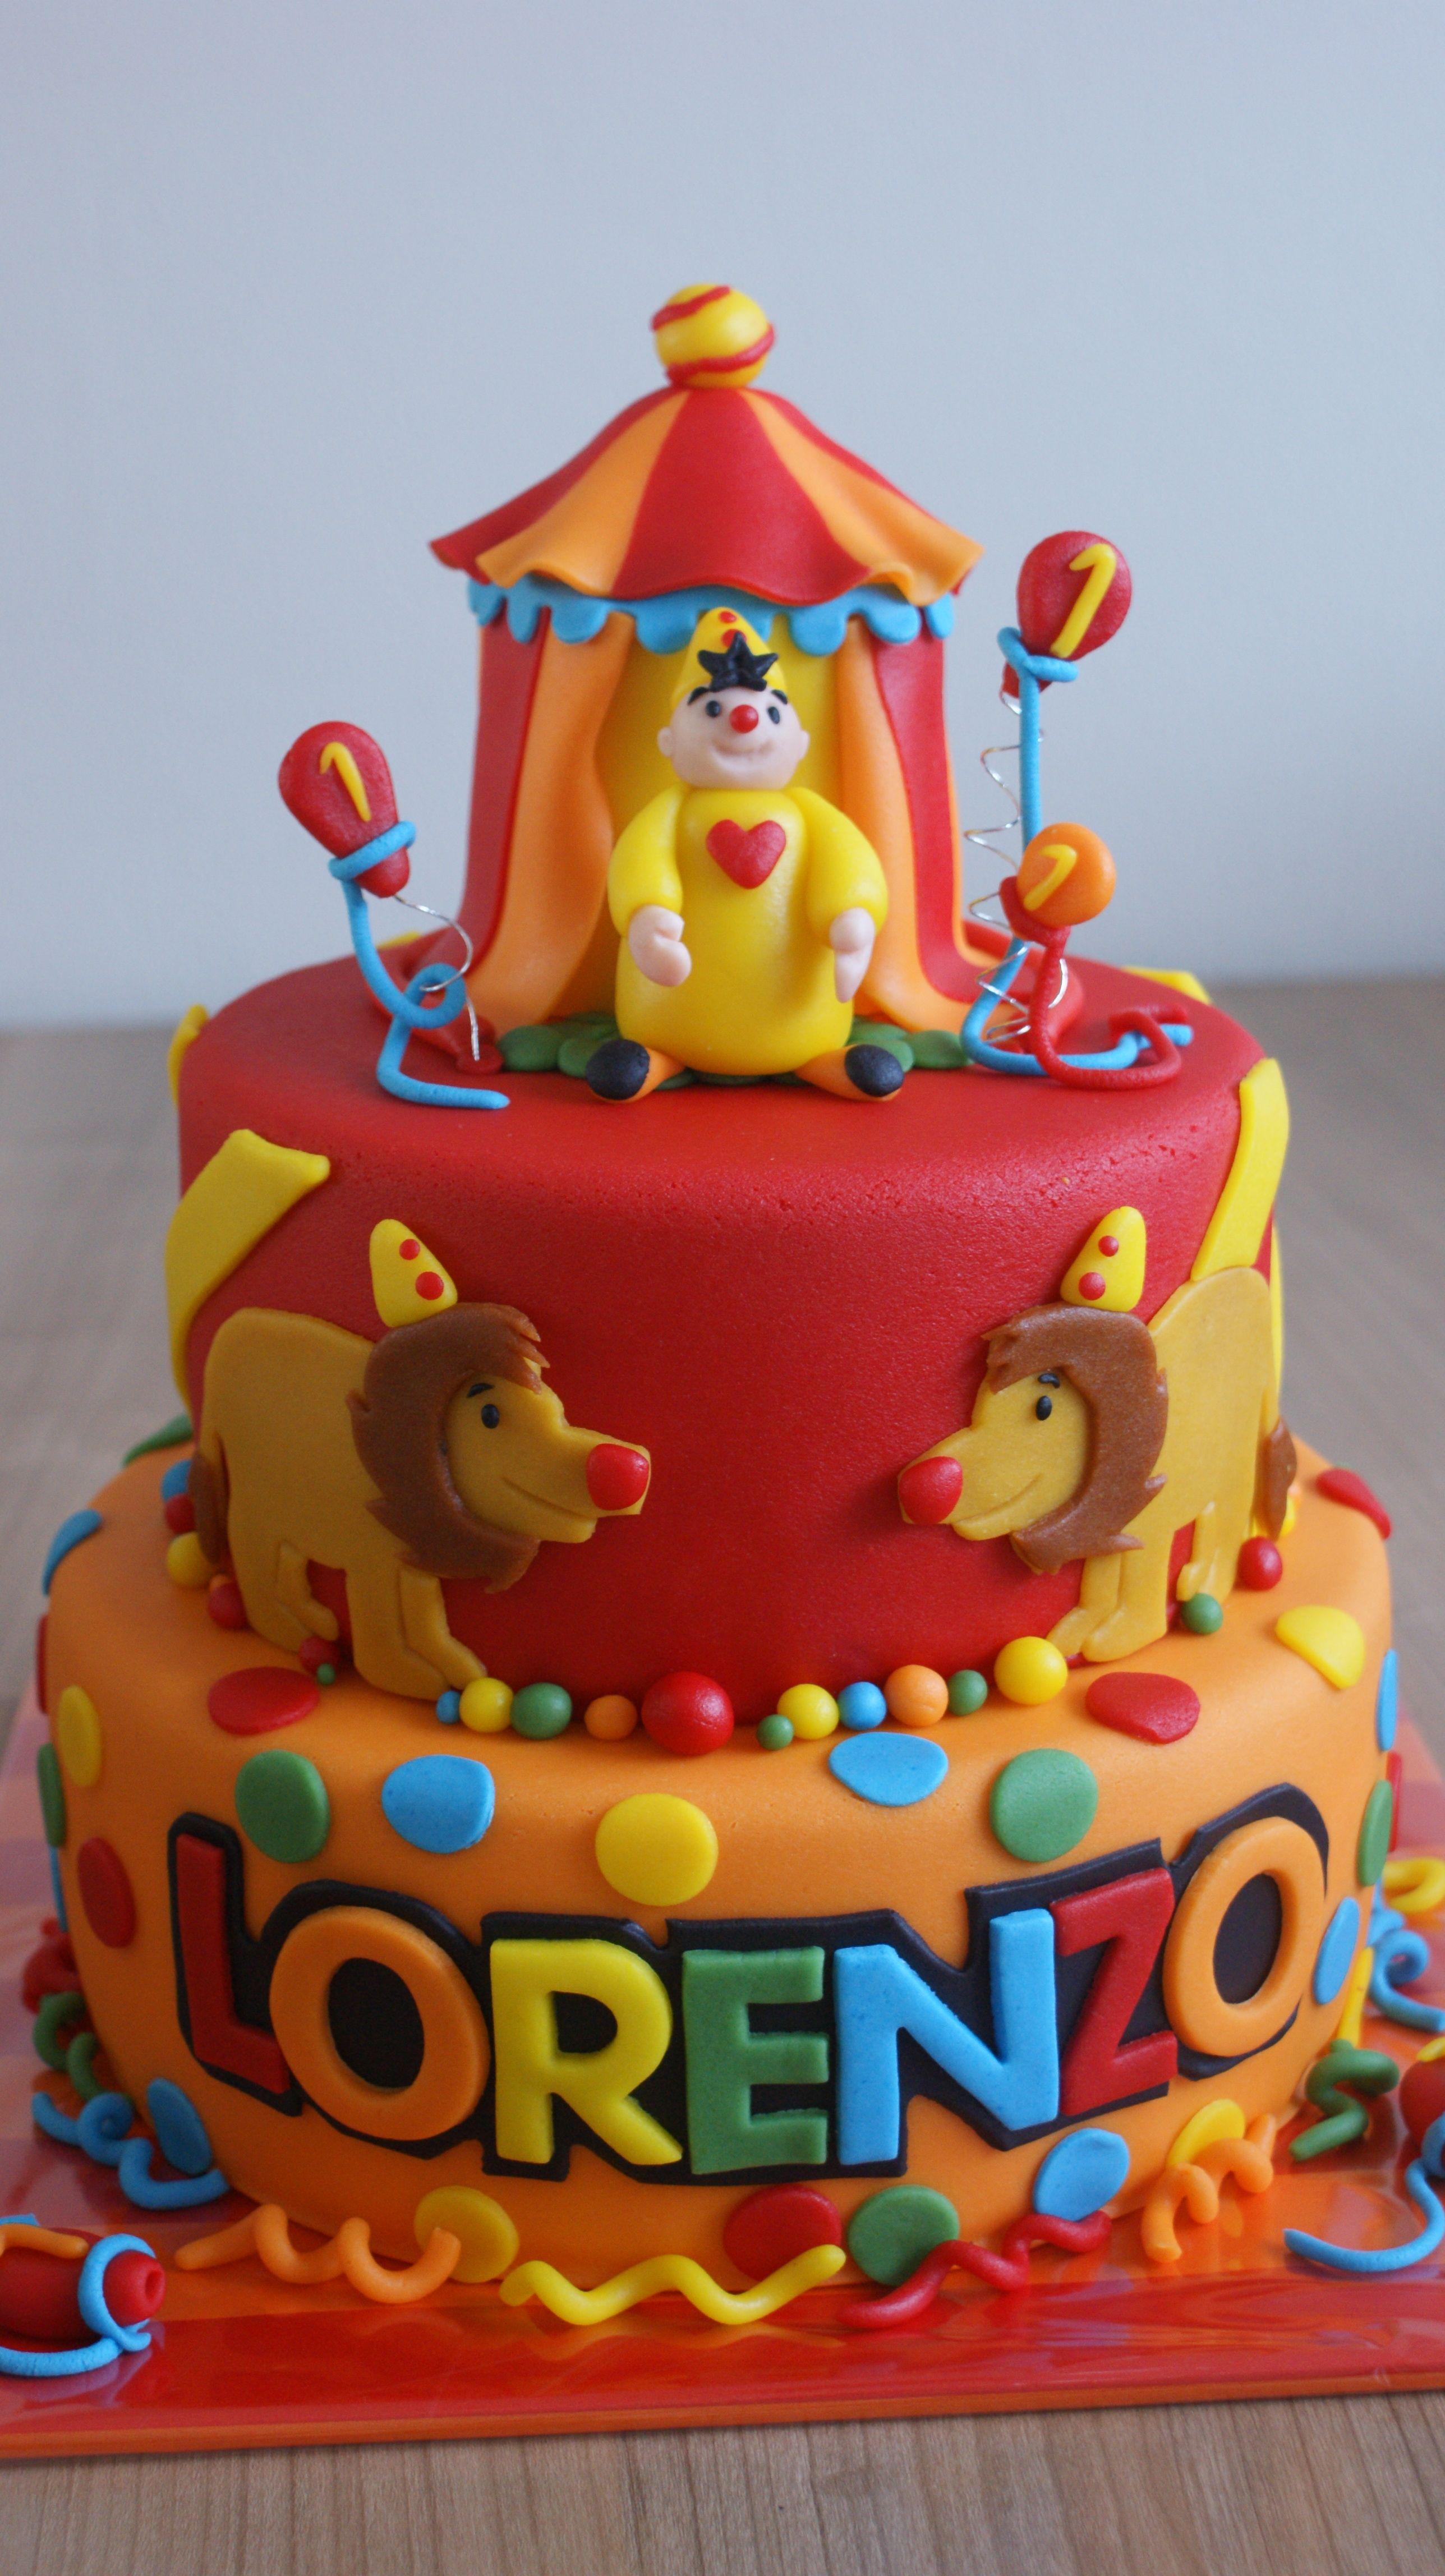 Funny Clown Cake Famous Dutchbelgium Clown Bj Cake Ideas